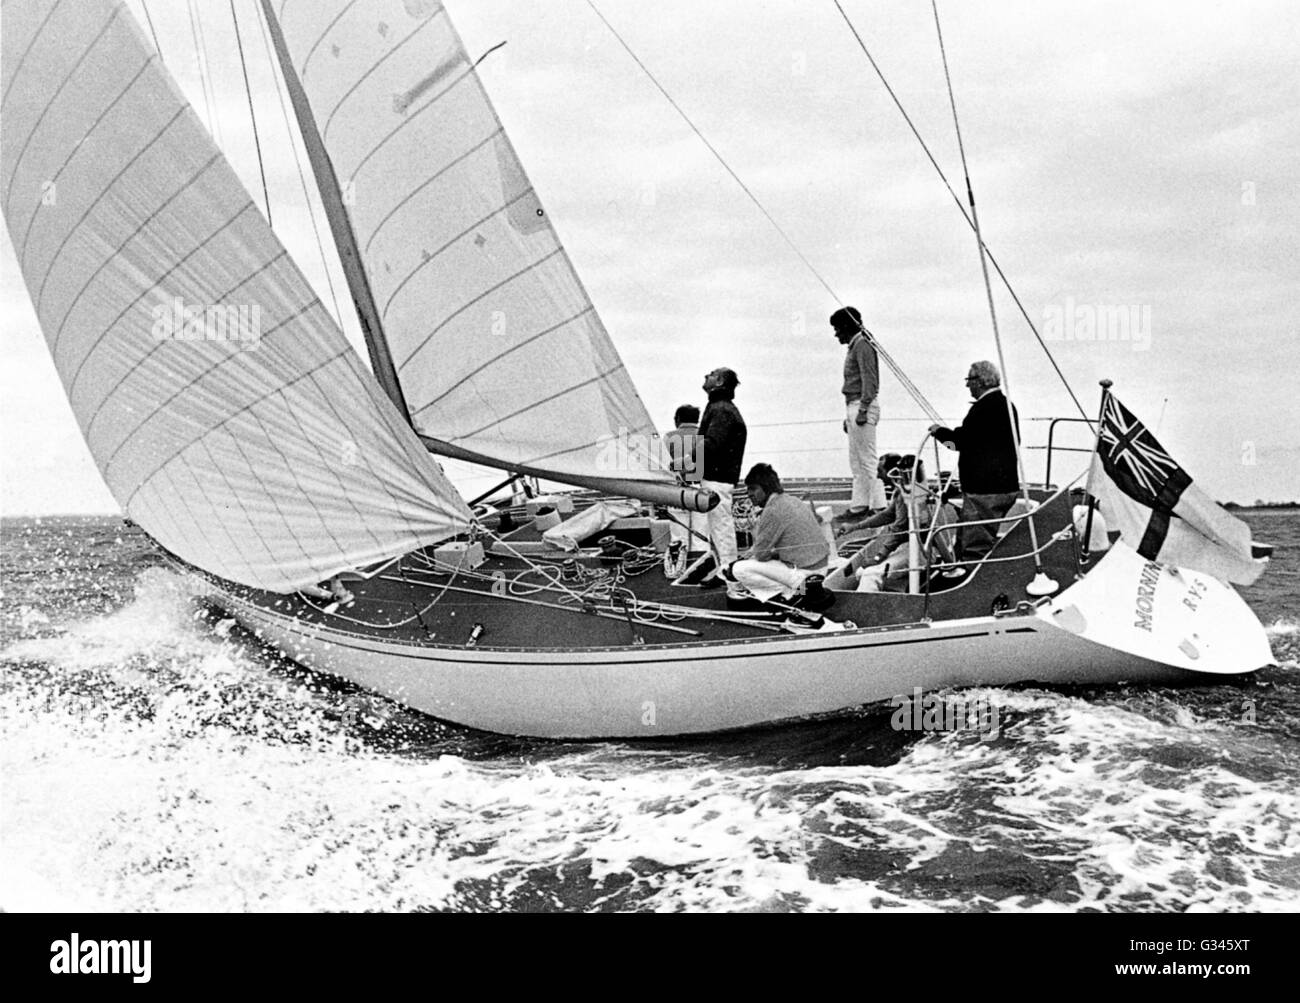 ajaxnetphoto-10th-may-1975-solent-englan